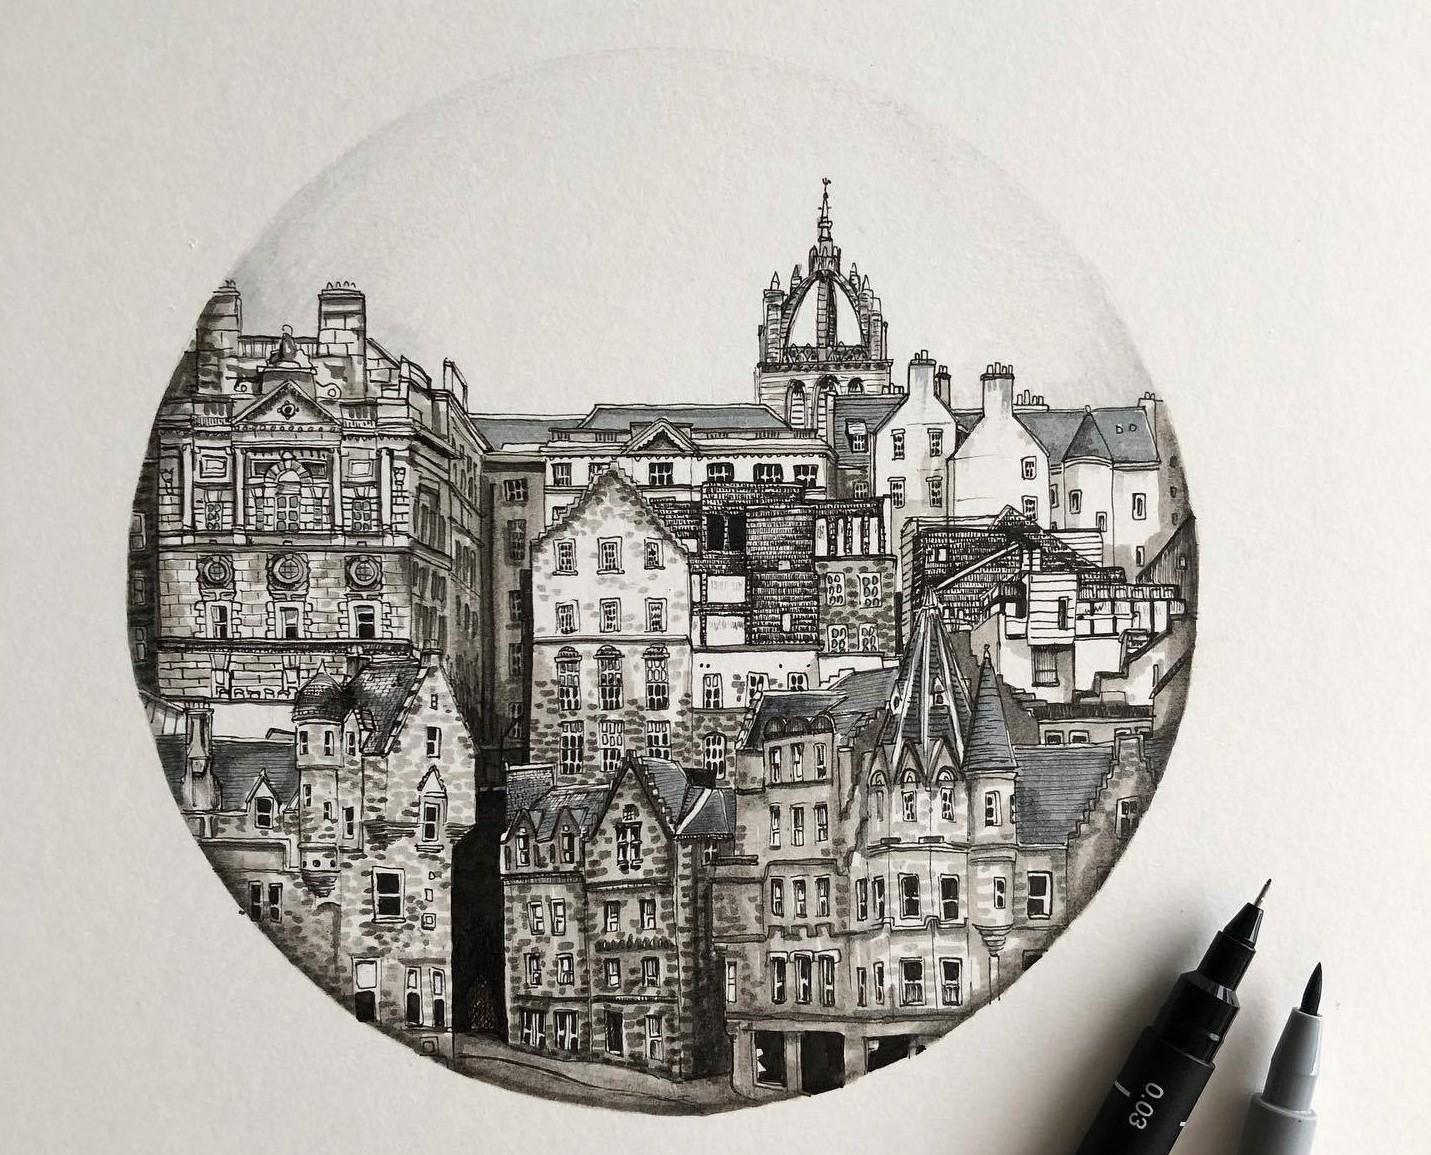 An Interview with Phoebe Atkey: Artist, Illustrator, Businesswoman